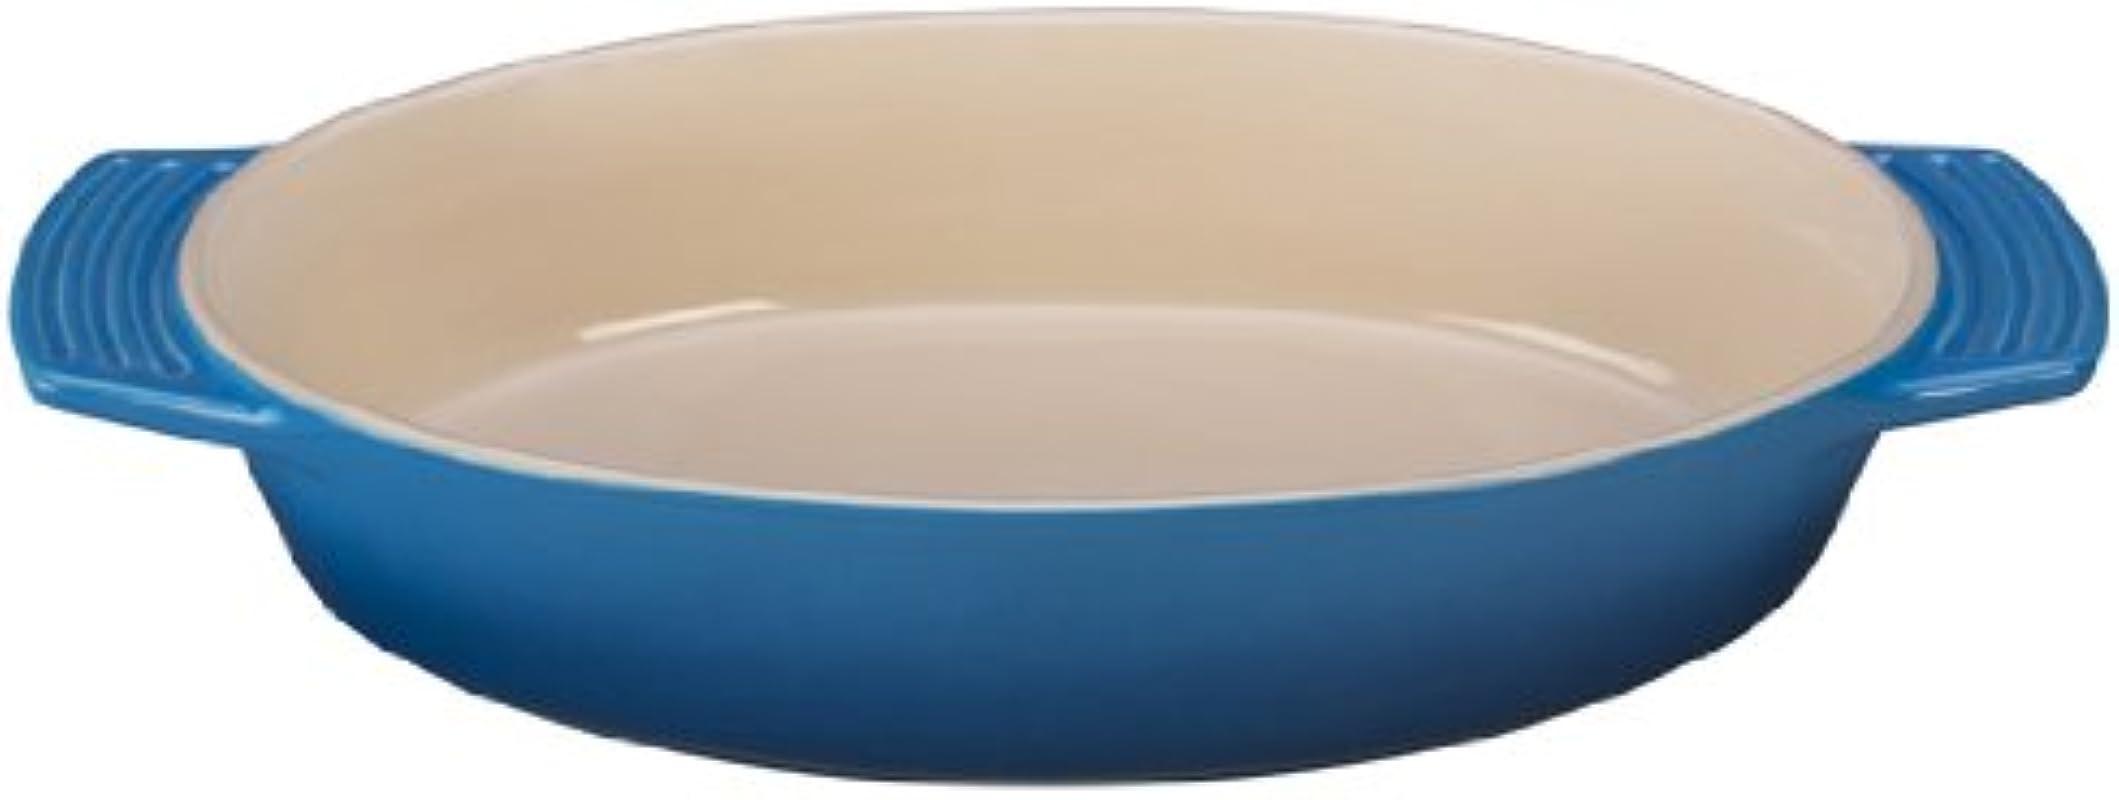 Le Creuset Stoneware Oval Dish 3 1 2 Quart Marseille